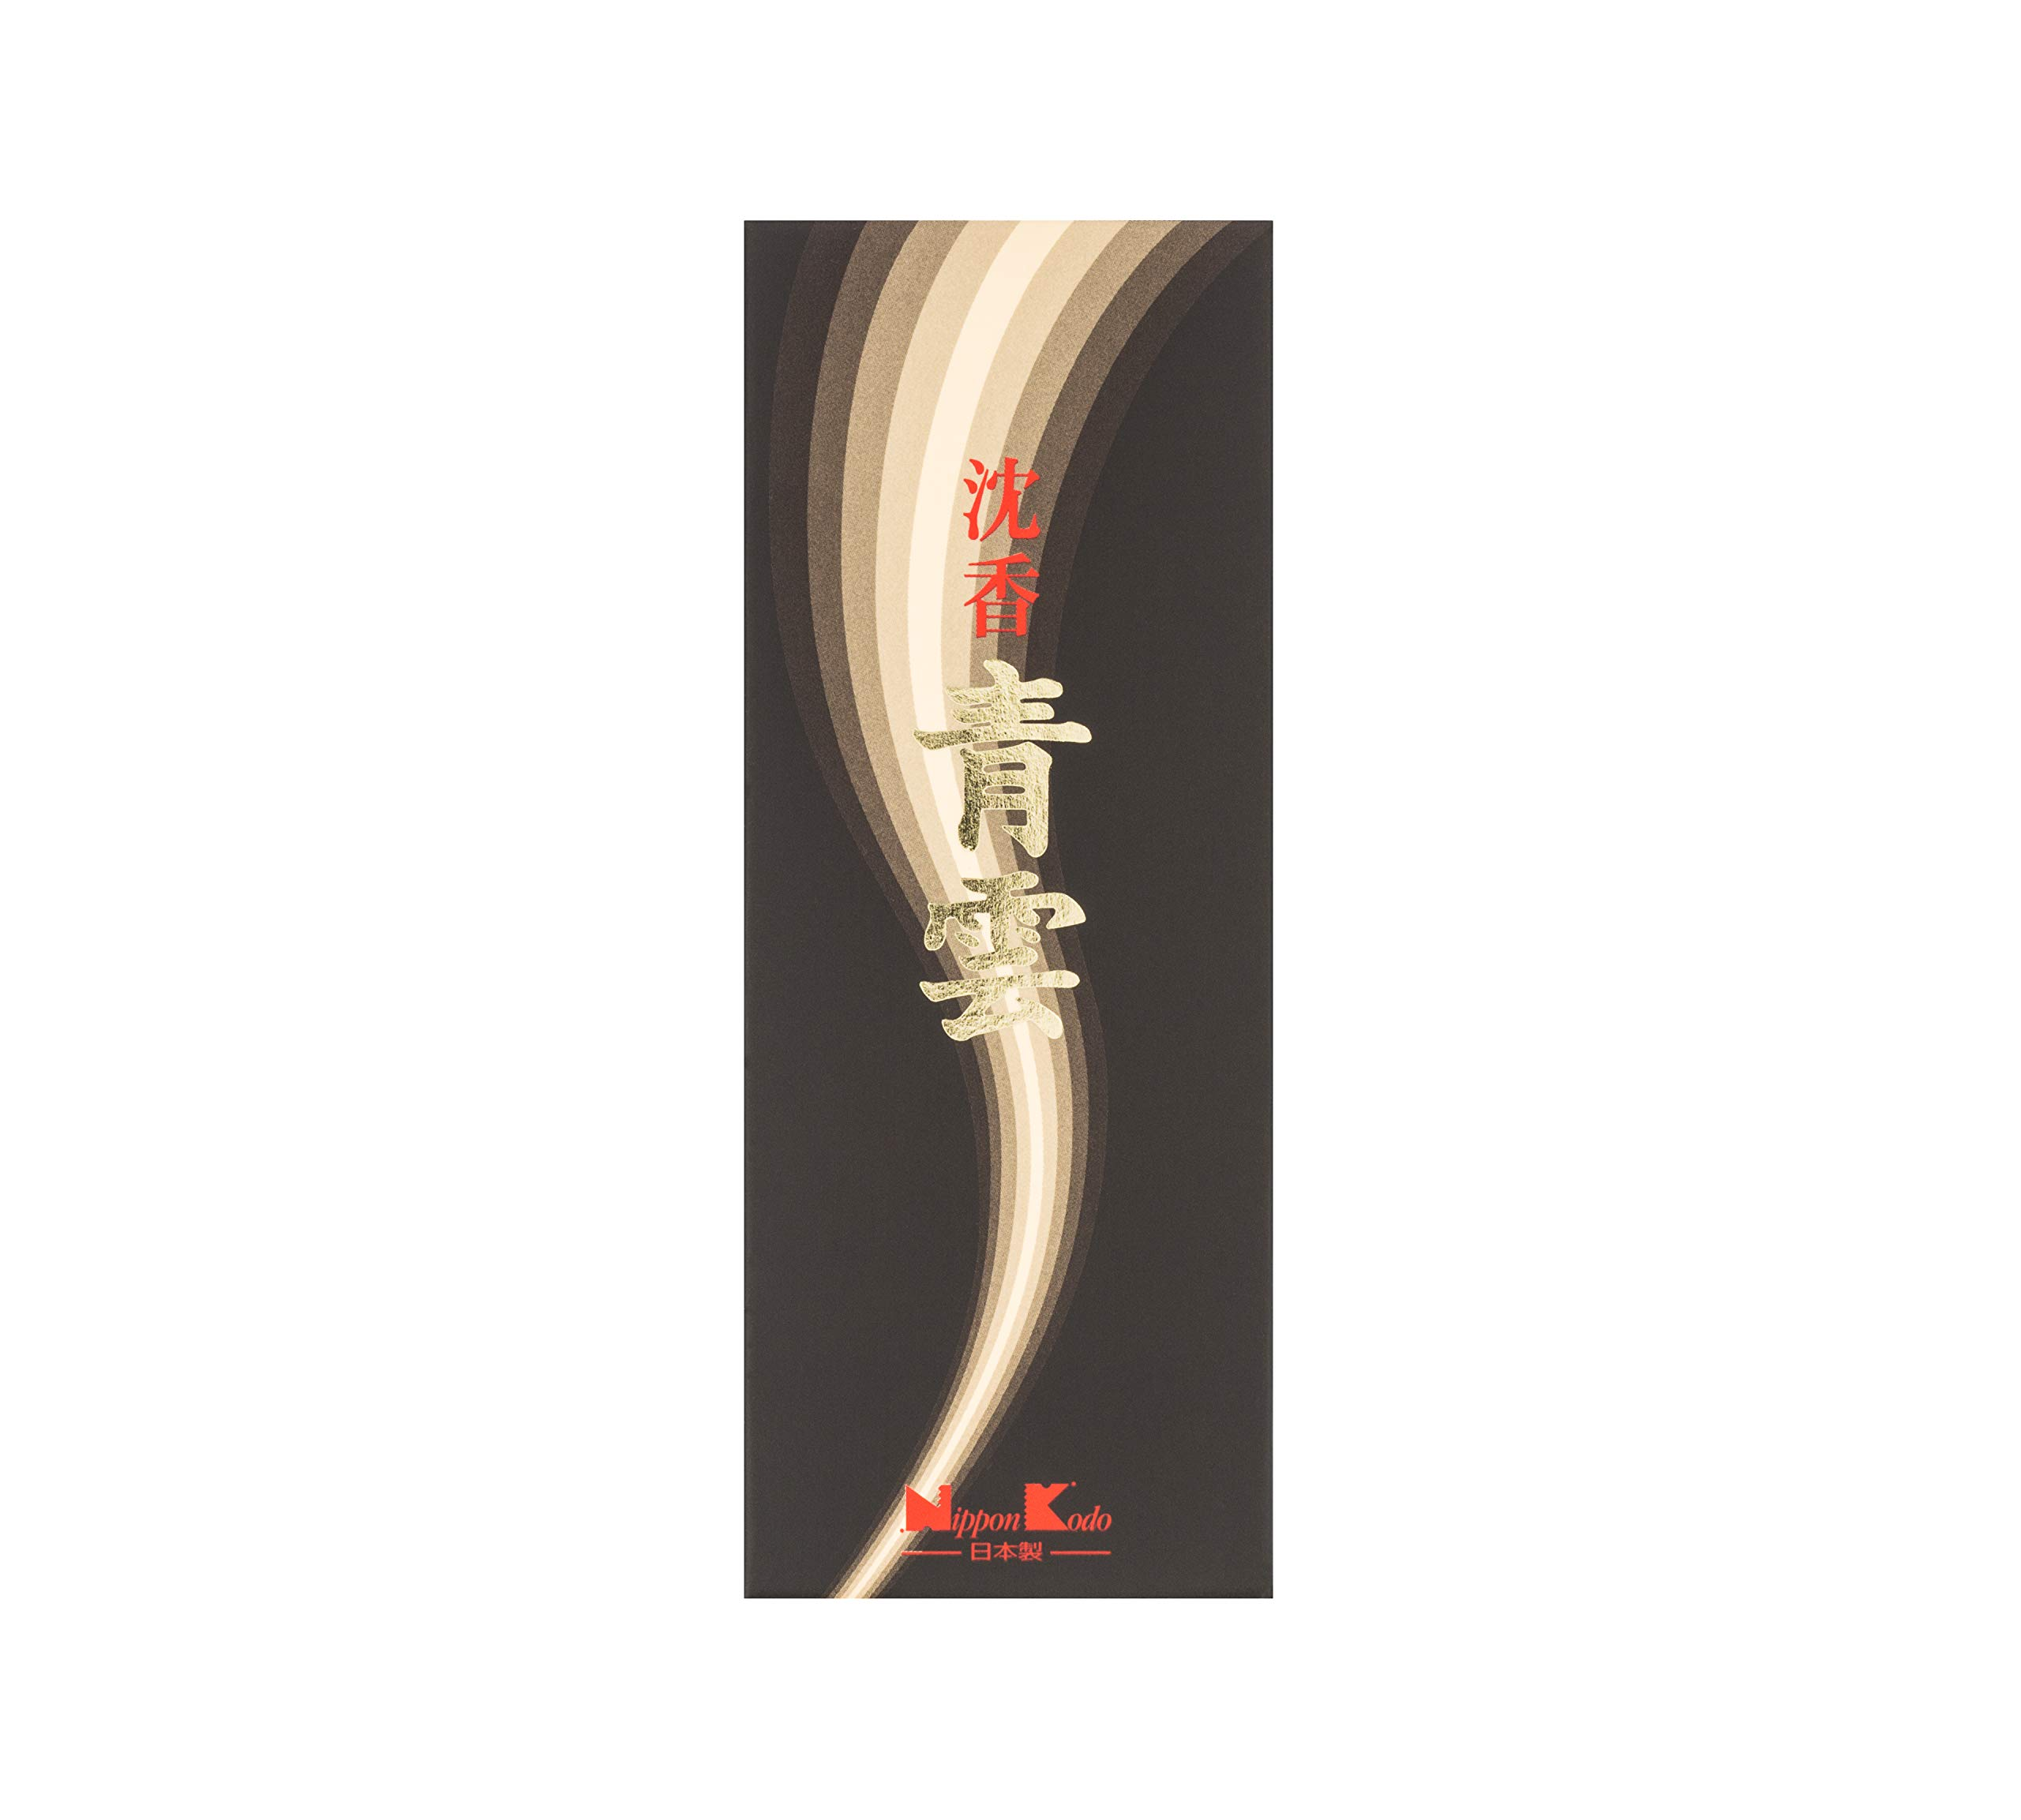 Nippon Kodo - Seiun - Jinkoh 170 sticks, wood by nippon kodo (Image #3)